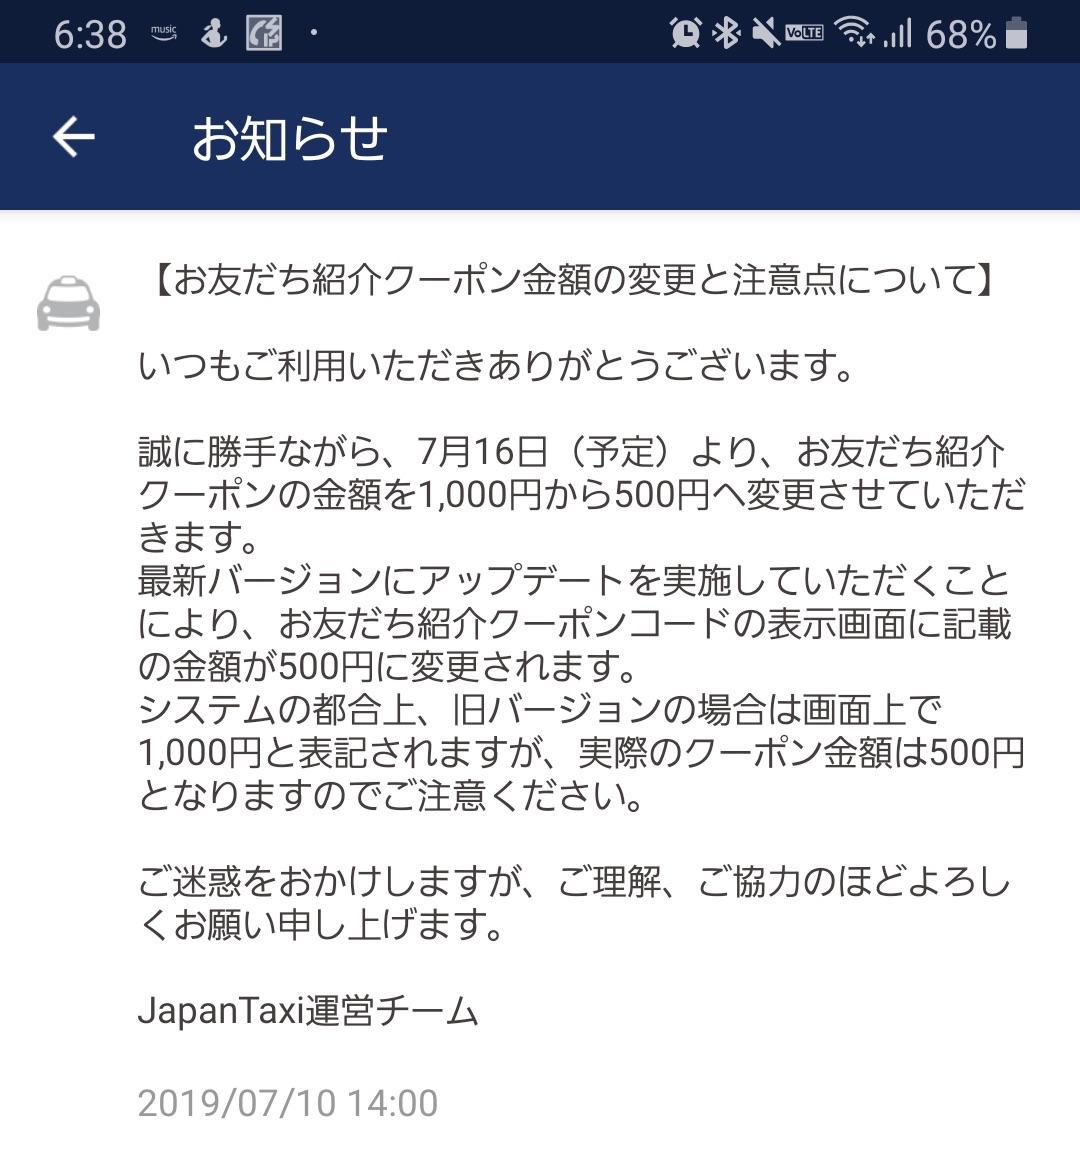 JapanTaxiお知らせ